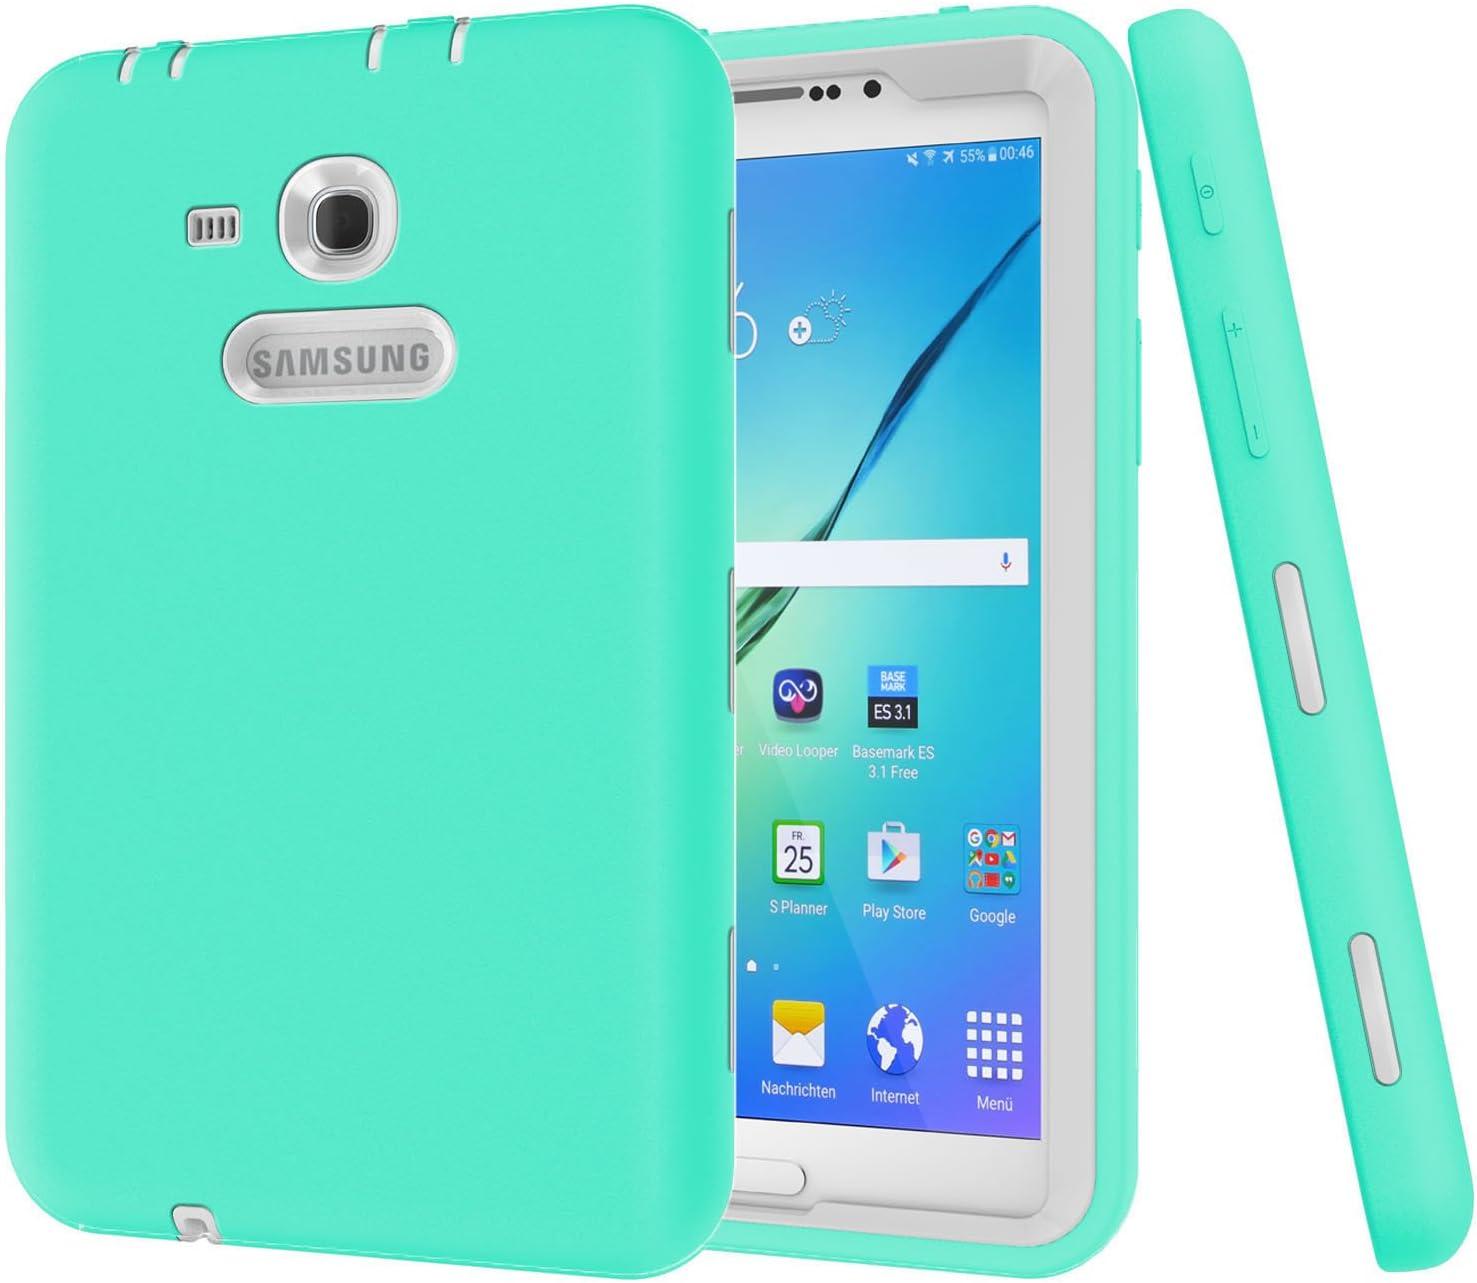 Galaxy Tab 3 Lite 7.0 Case Beimu 3 in 1 Shockproof Heavy Duty Rugged Hybrid Armor Defender Protection Cover for Samsung Galaxy Tab E lite 7.0 SM-T113 /& Tab 3 Lite T110 T111